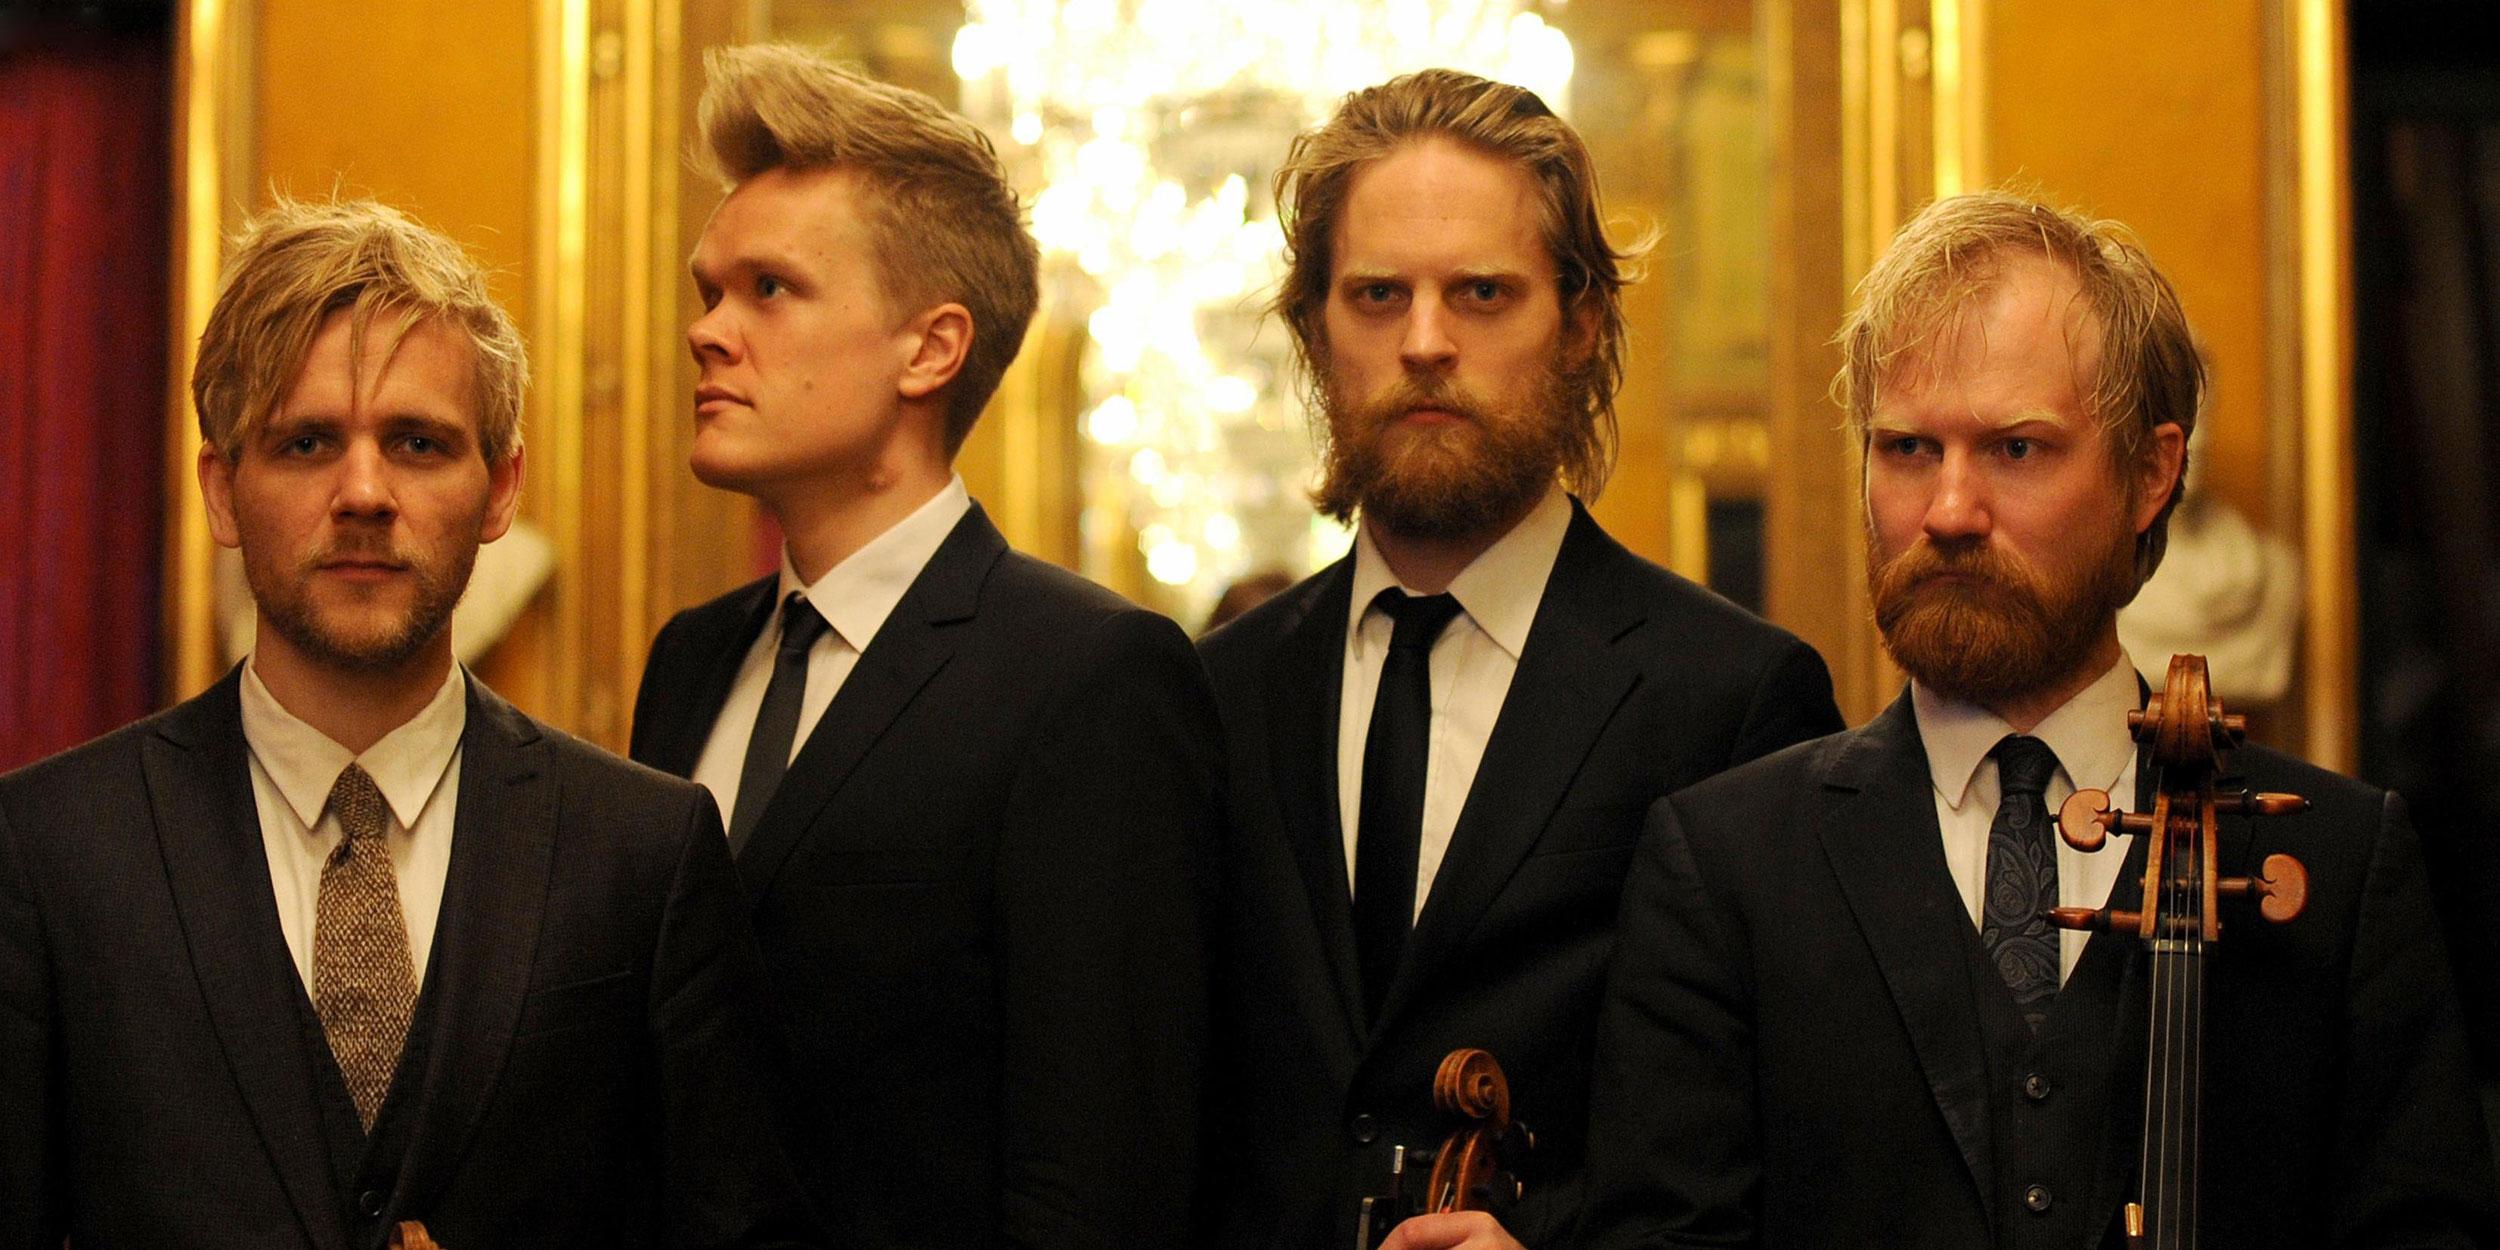 Danish_String_Quartet_[c]_Caroline_Bittencourt